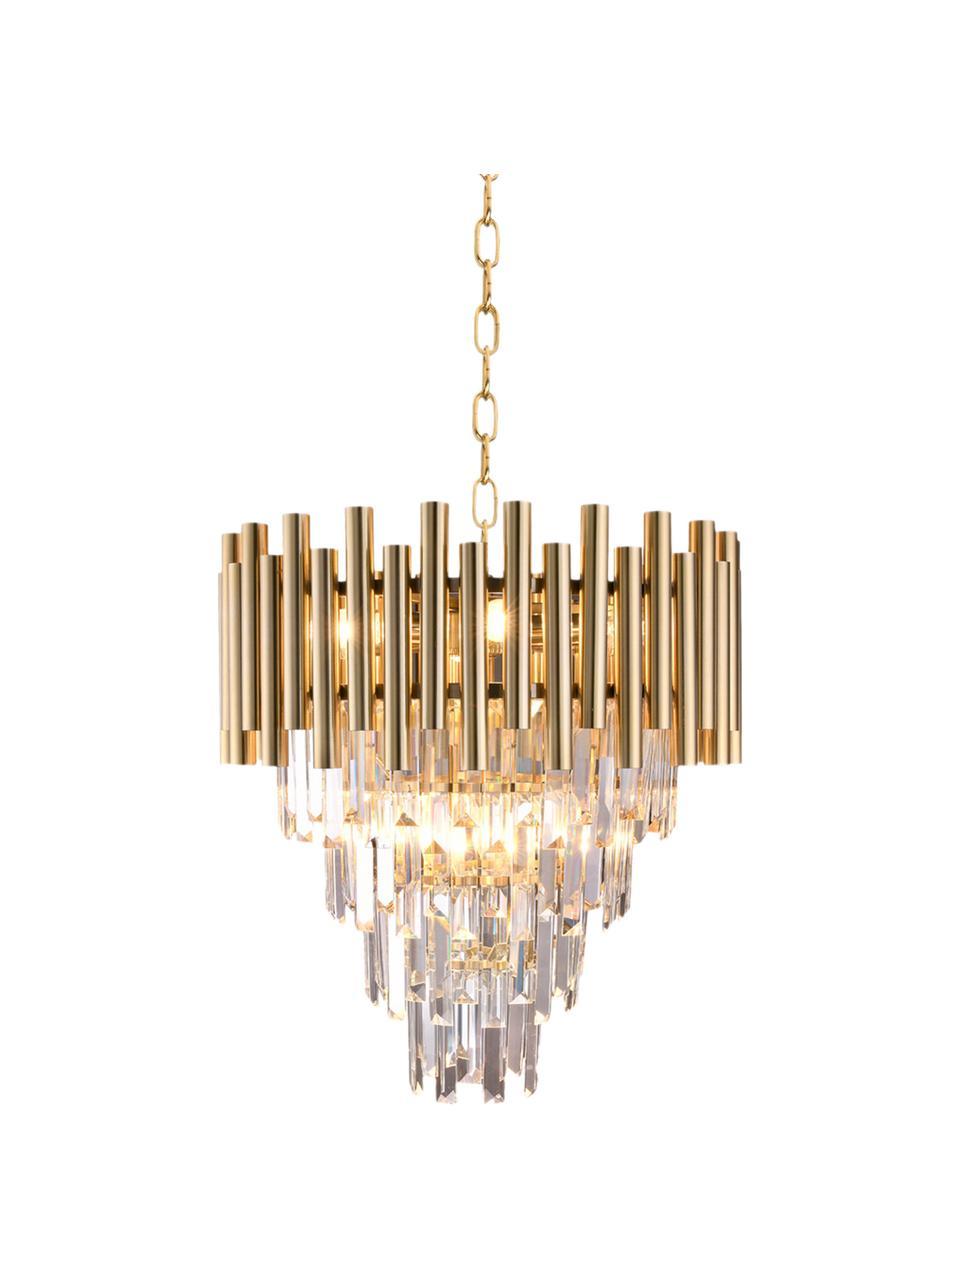 Lampadario dorato Madison, Struttura: metallo rivestito, Baldacchino: metallo rivestito, Dorato trasparente, Ø 45 x Alt. 50 cm